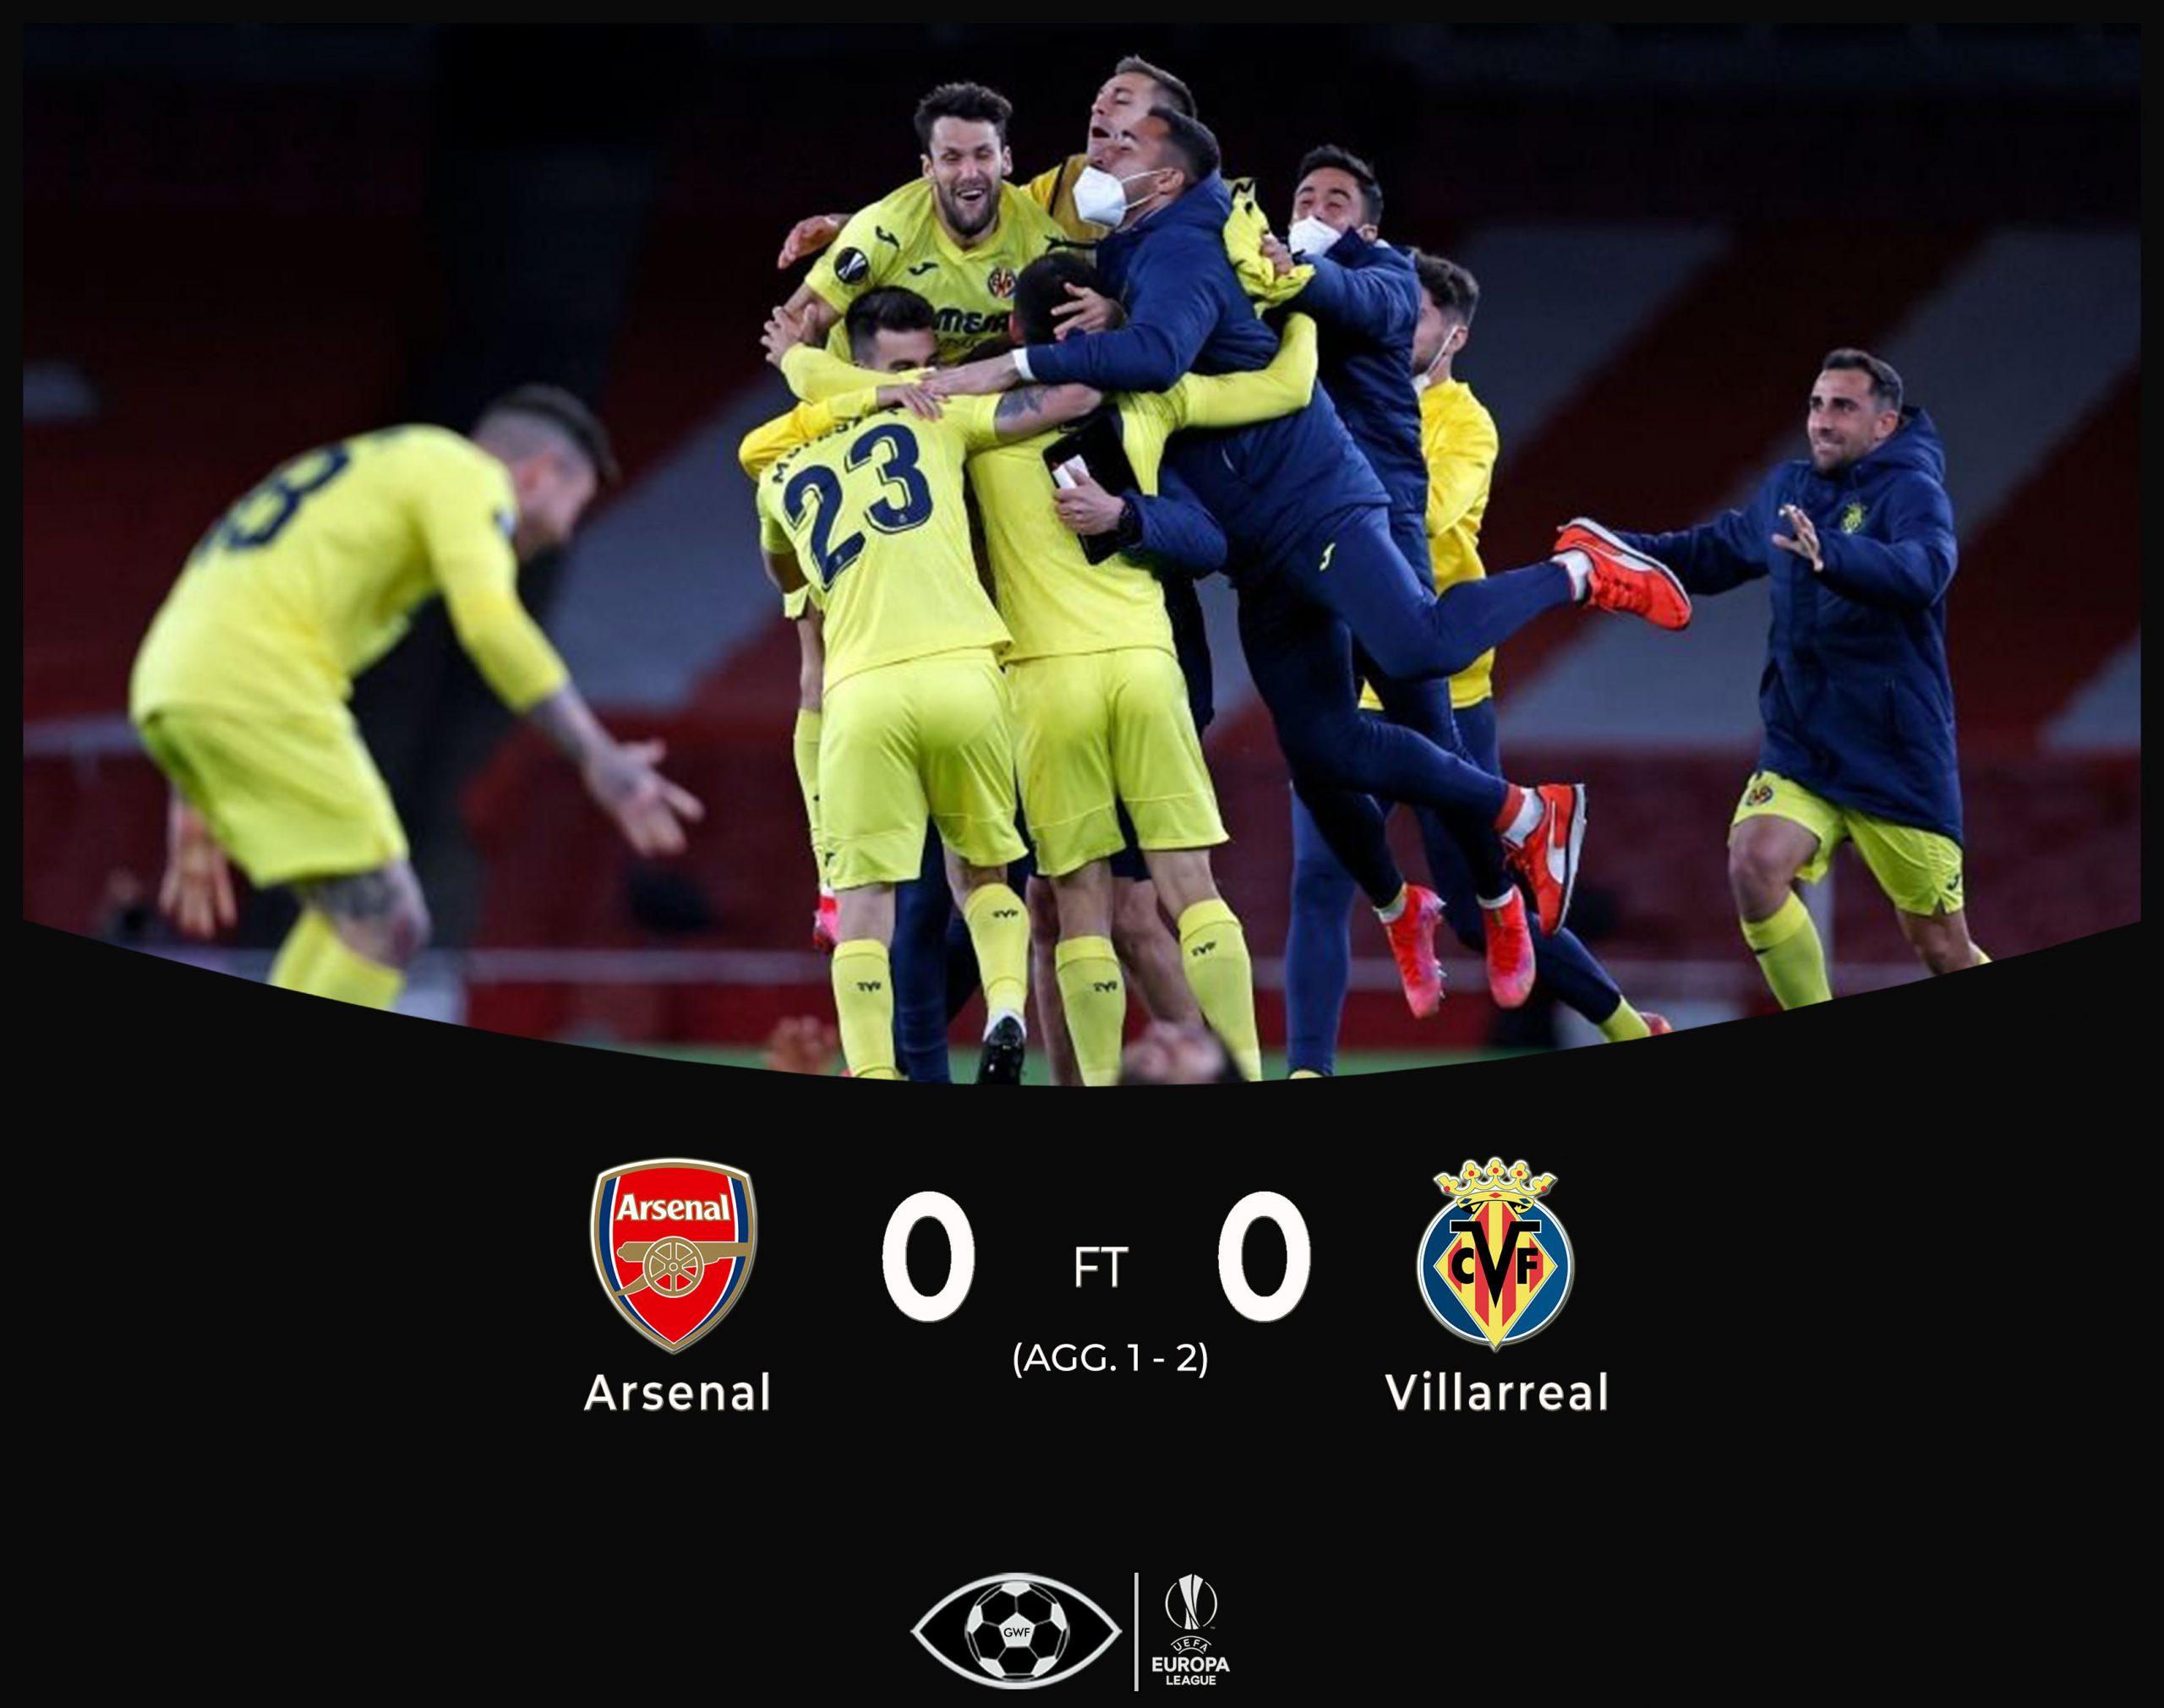 BREAKING: Villarreal Knocks Arsenal Out Of Europa League Final - #ARSVIL